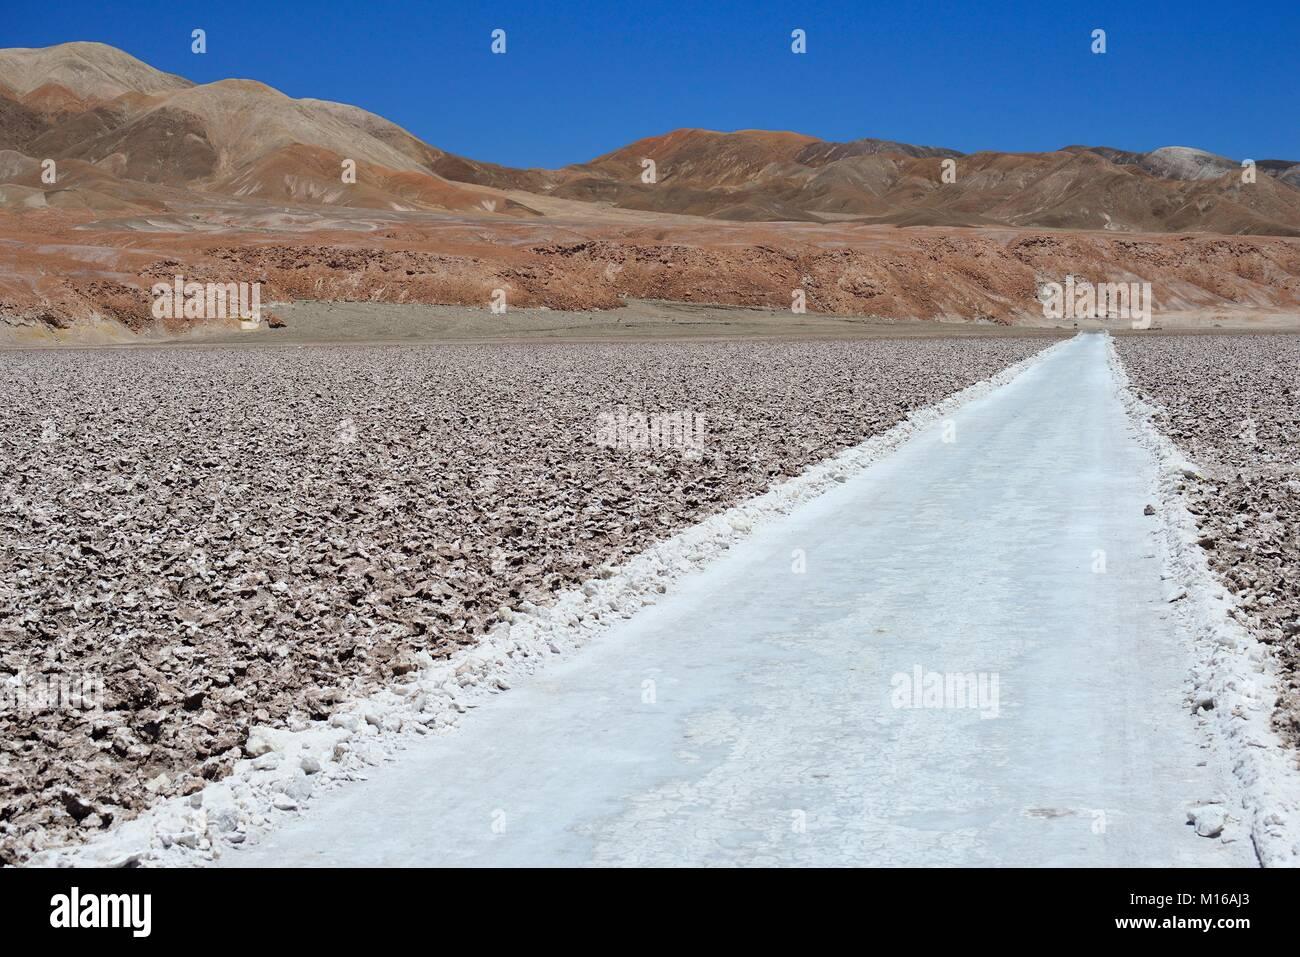 Road through Salzfeld, Salar de Atacama, near San Pedro de Atacama, Región de Antofagasta, Chile Stock Photo